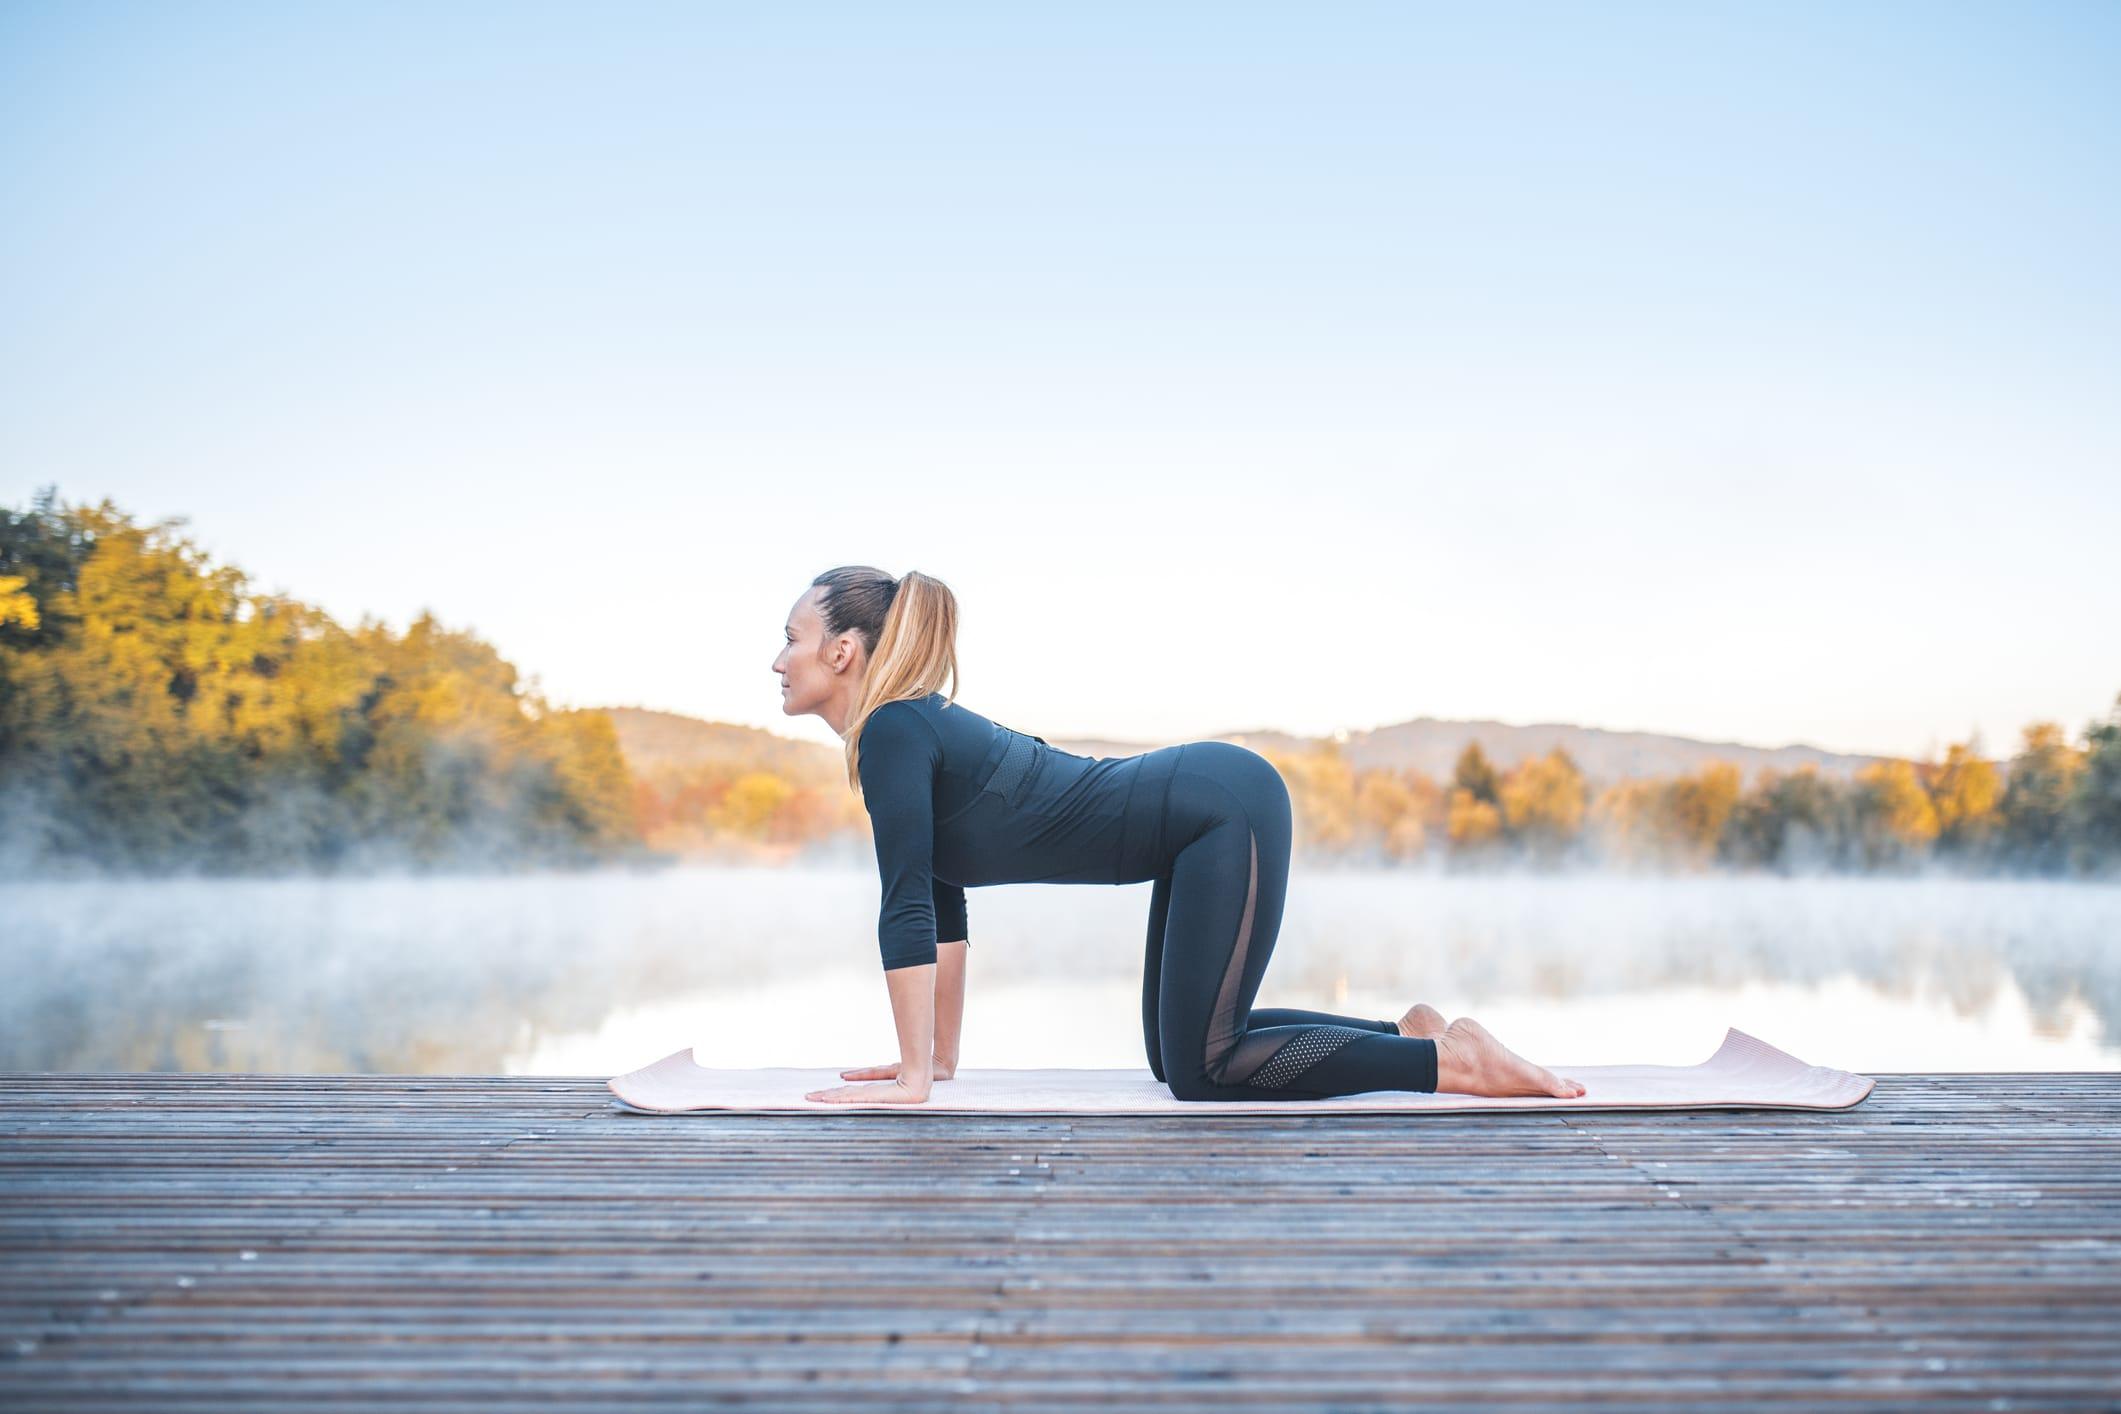 Pose de yoga - pose de vache (bitilasana